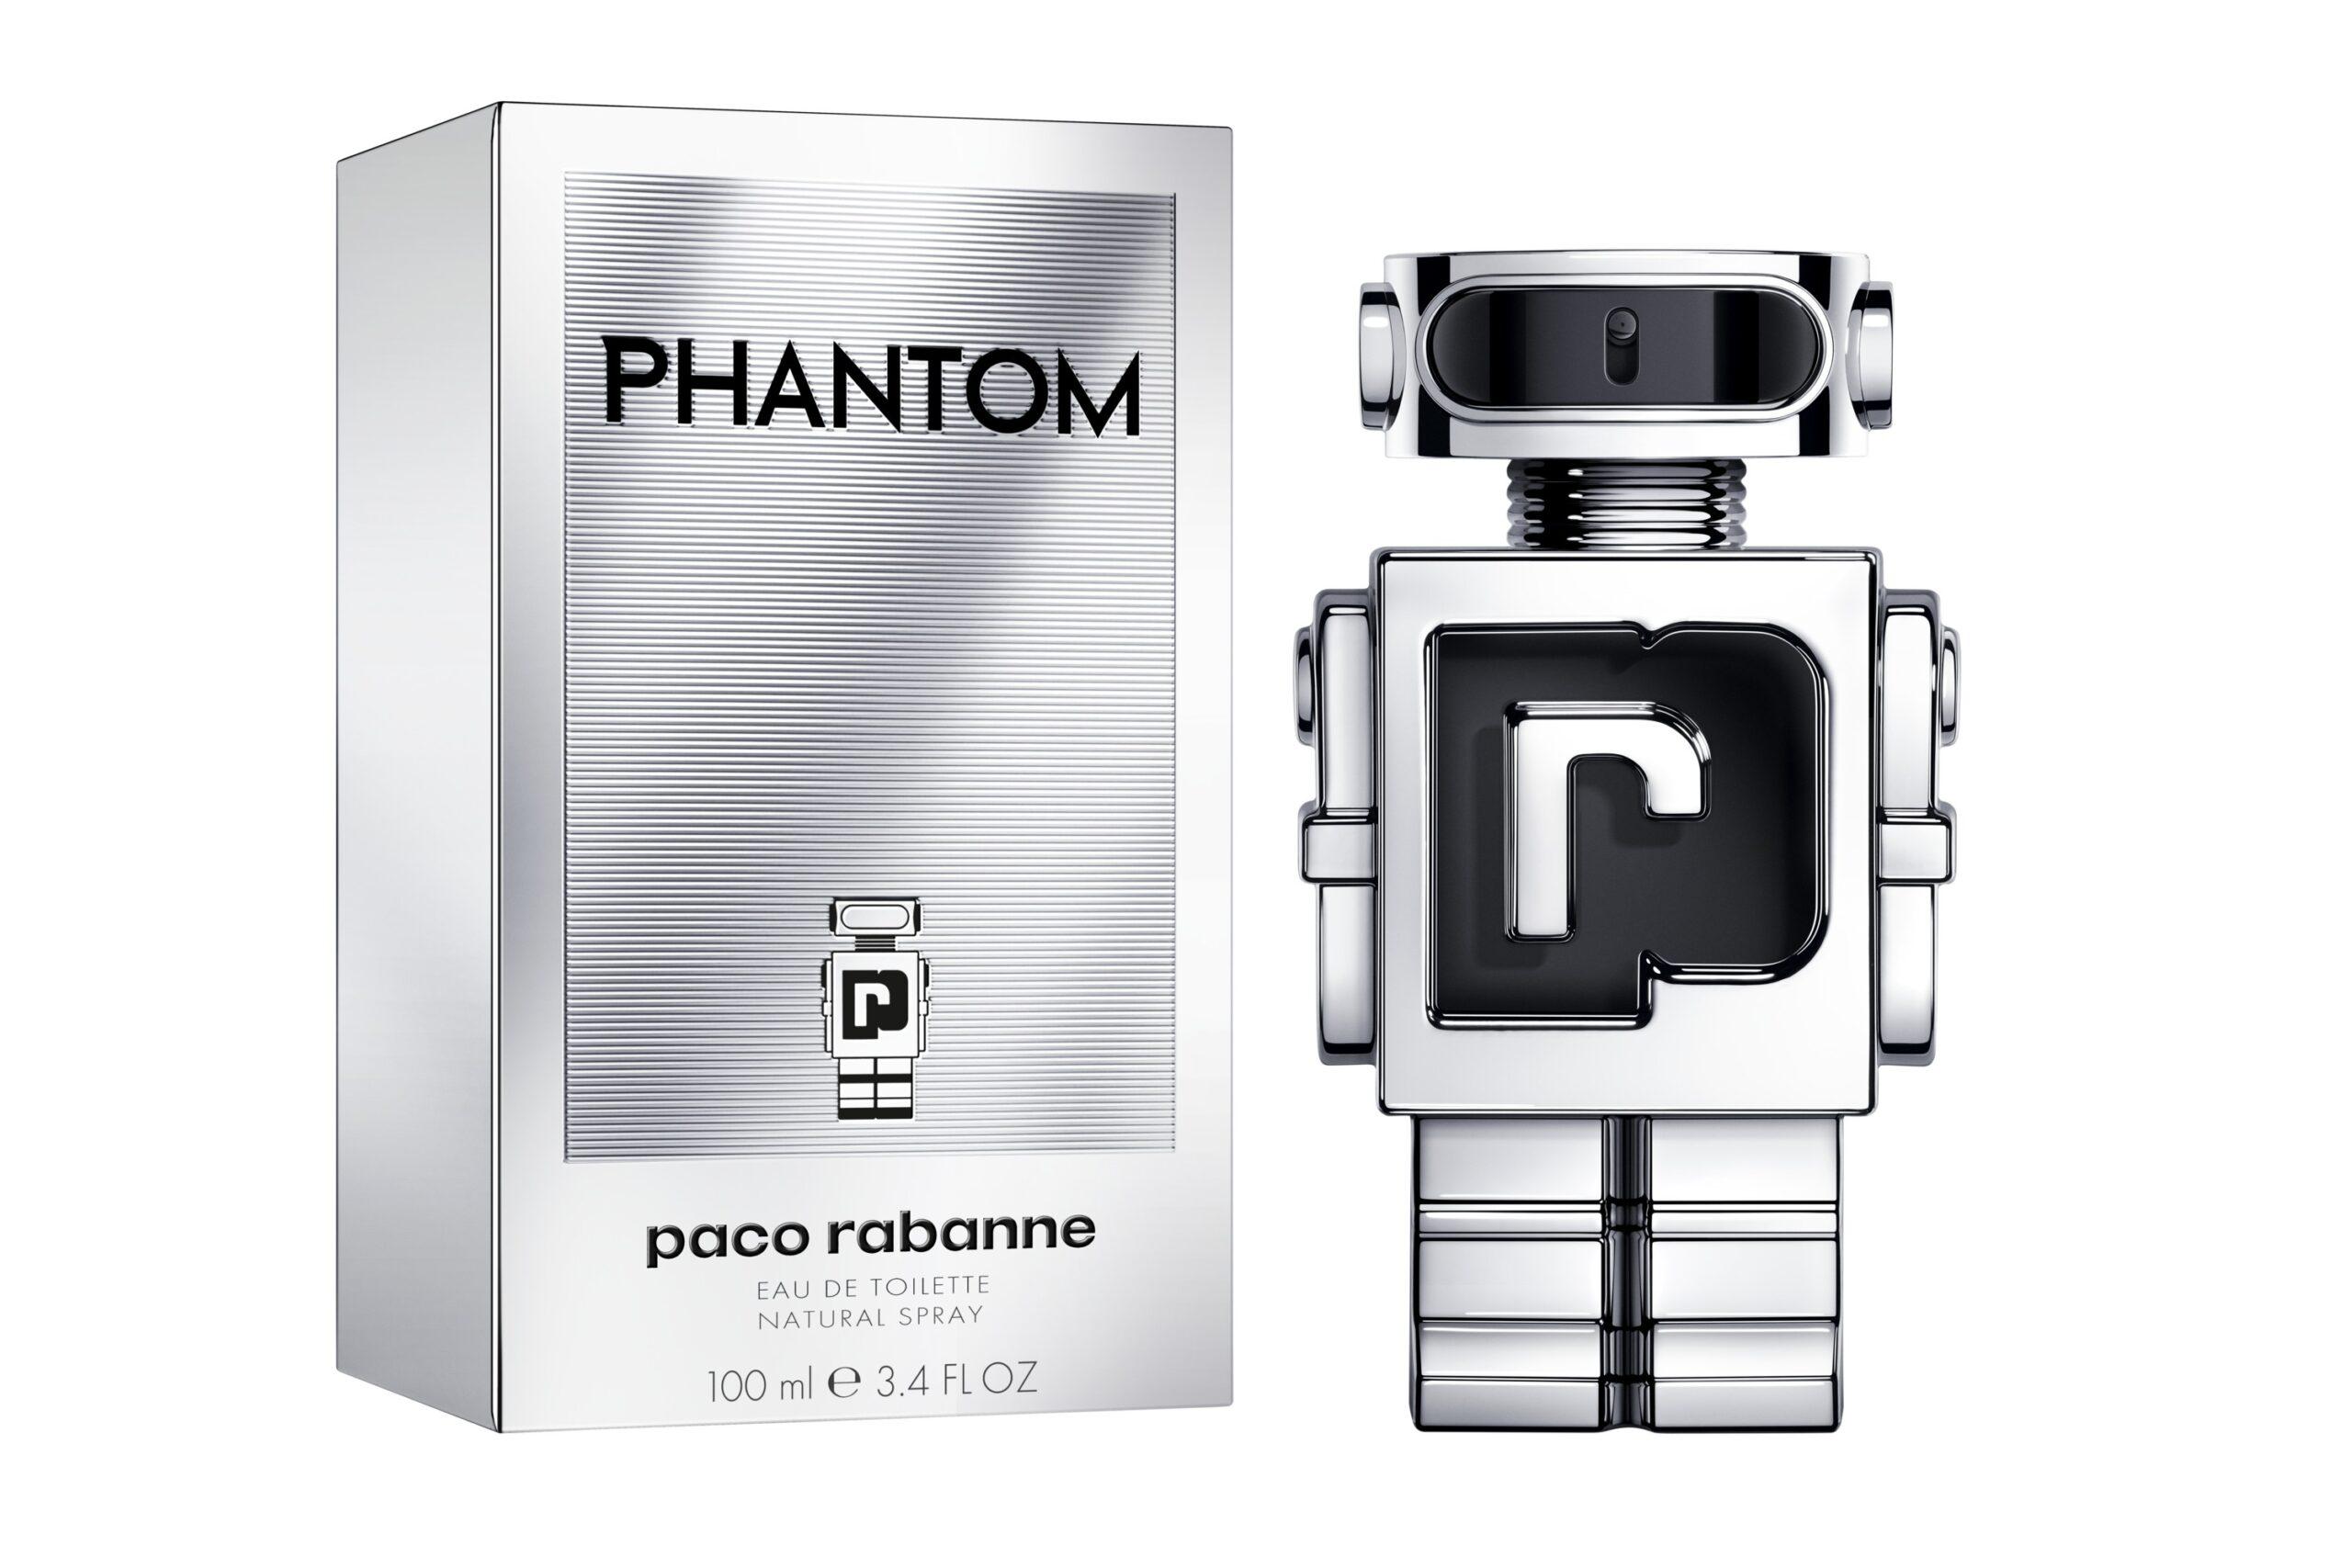 Paco Rabanne Phantom 100 mL